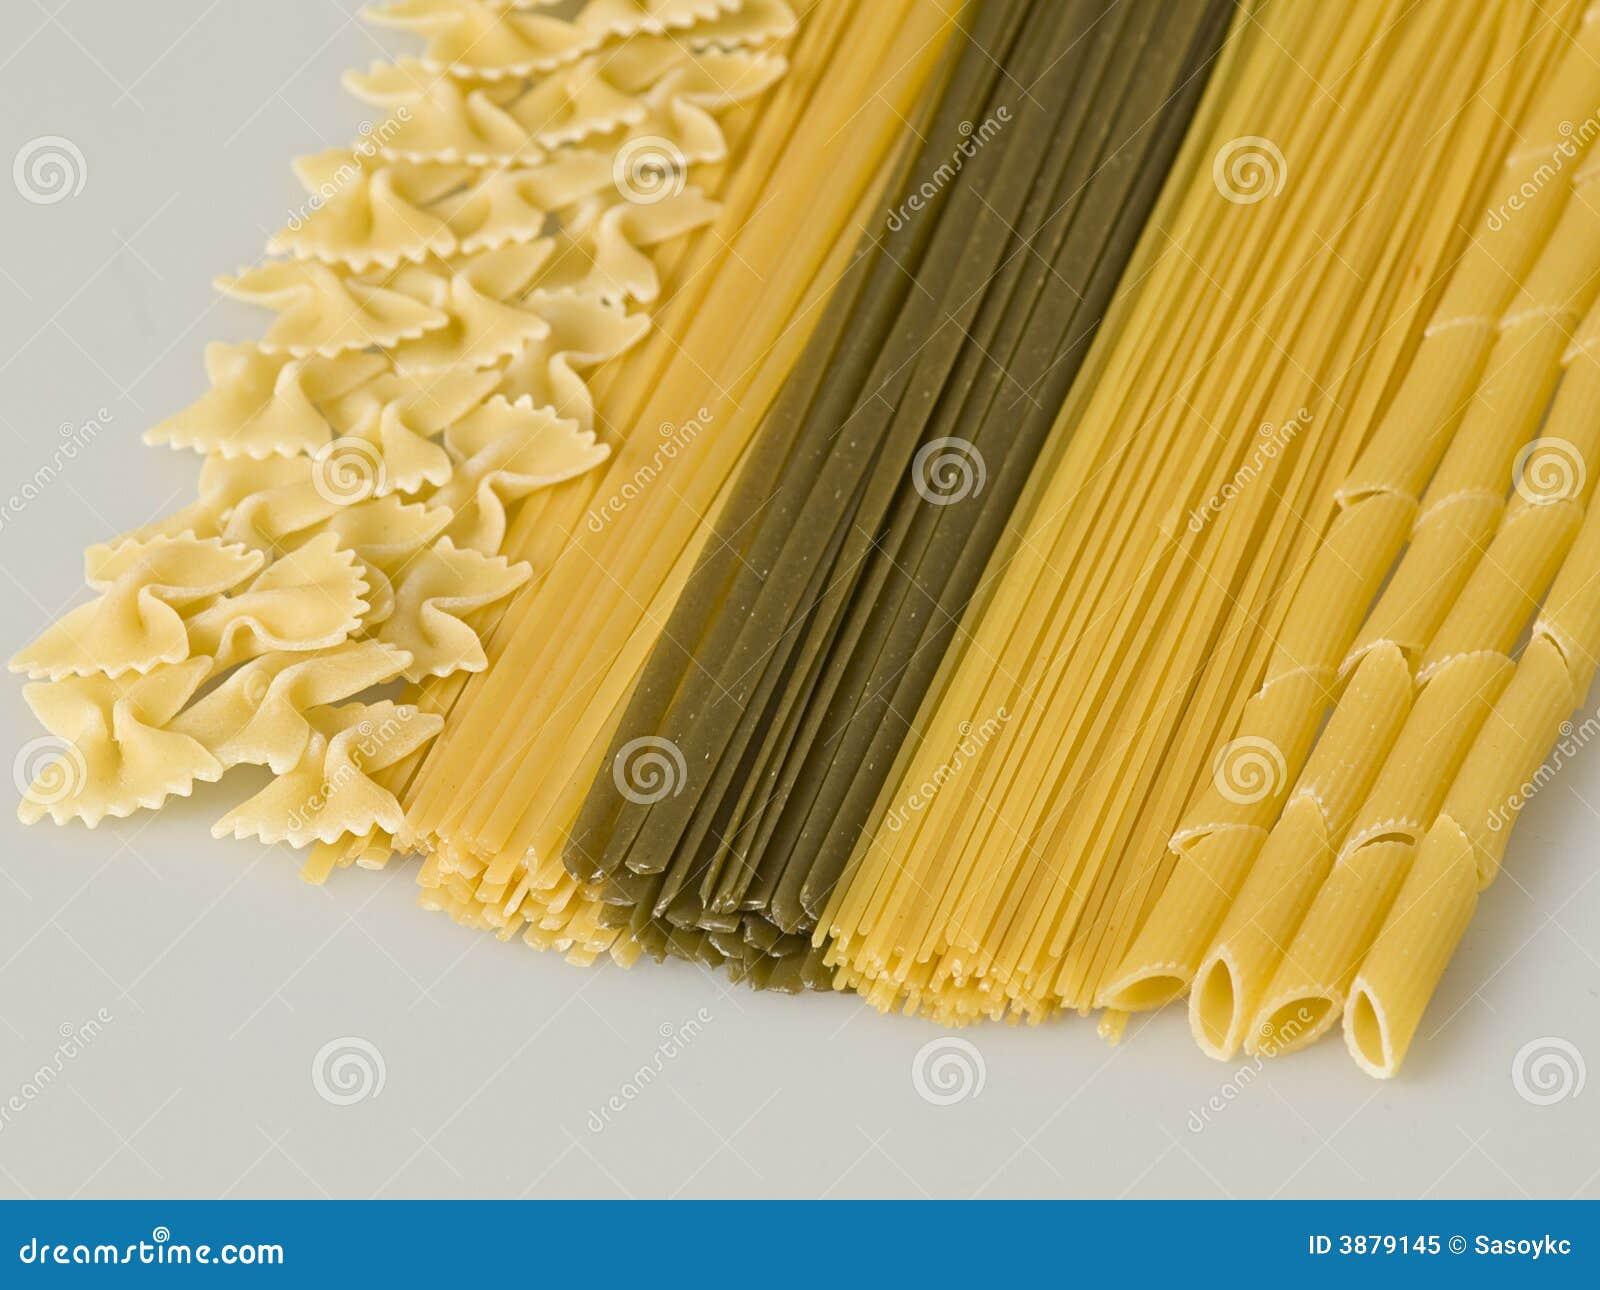 Healthy pasta types